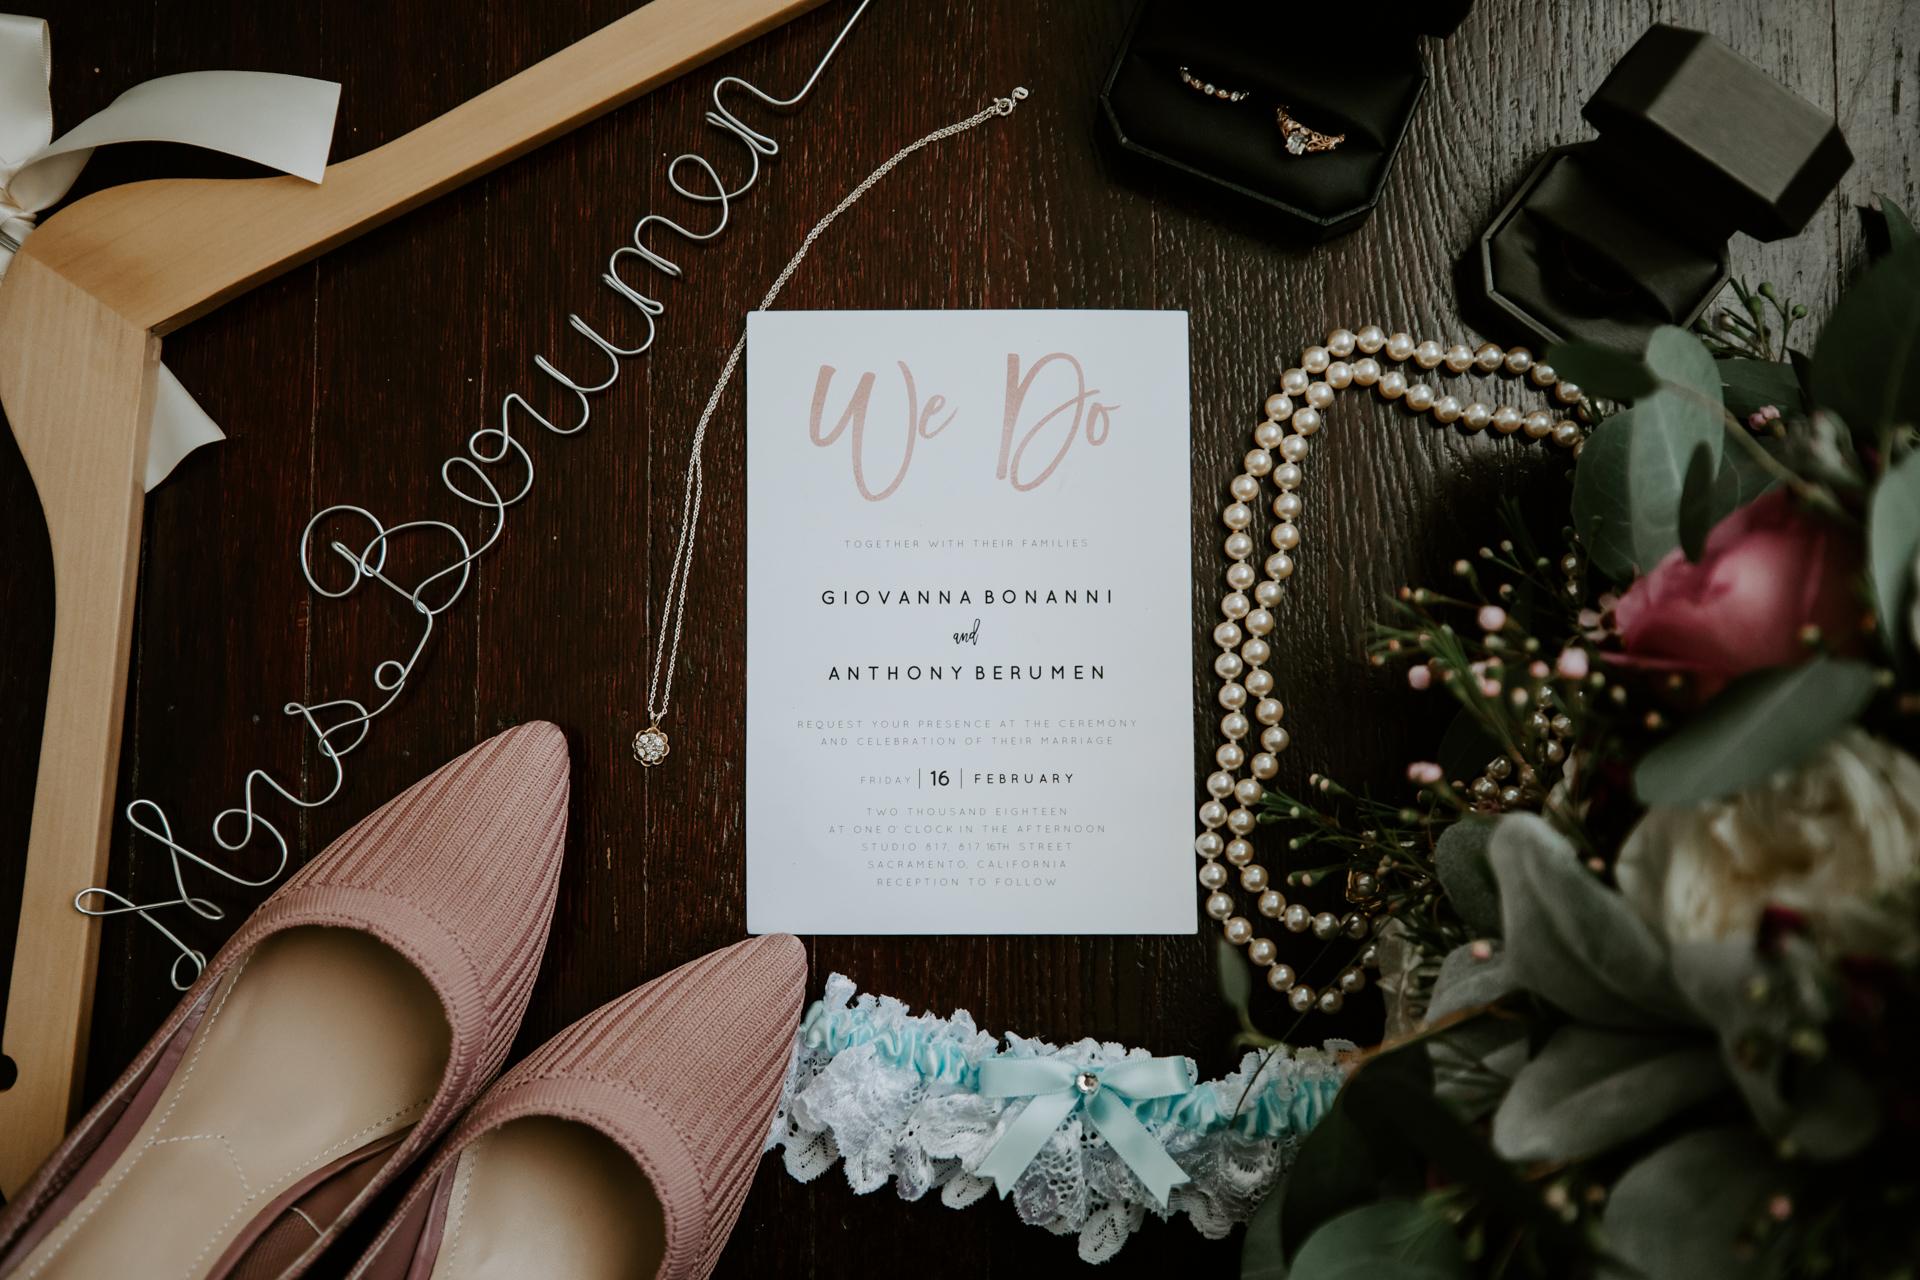 Giovanna_Anothony_Wedding-1001.jpg